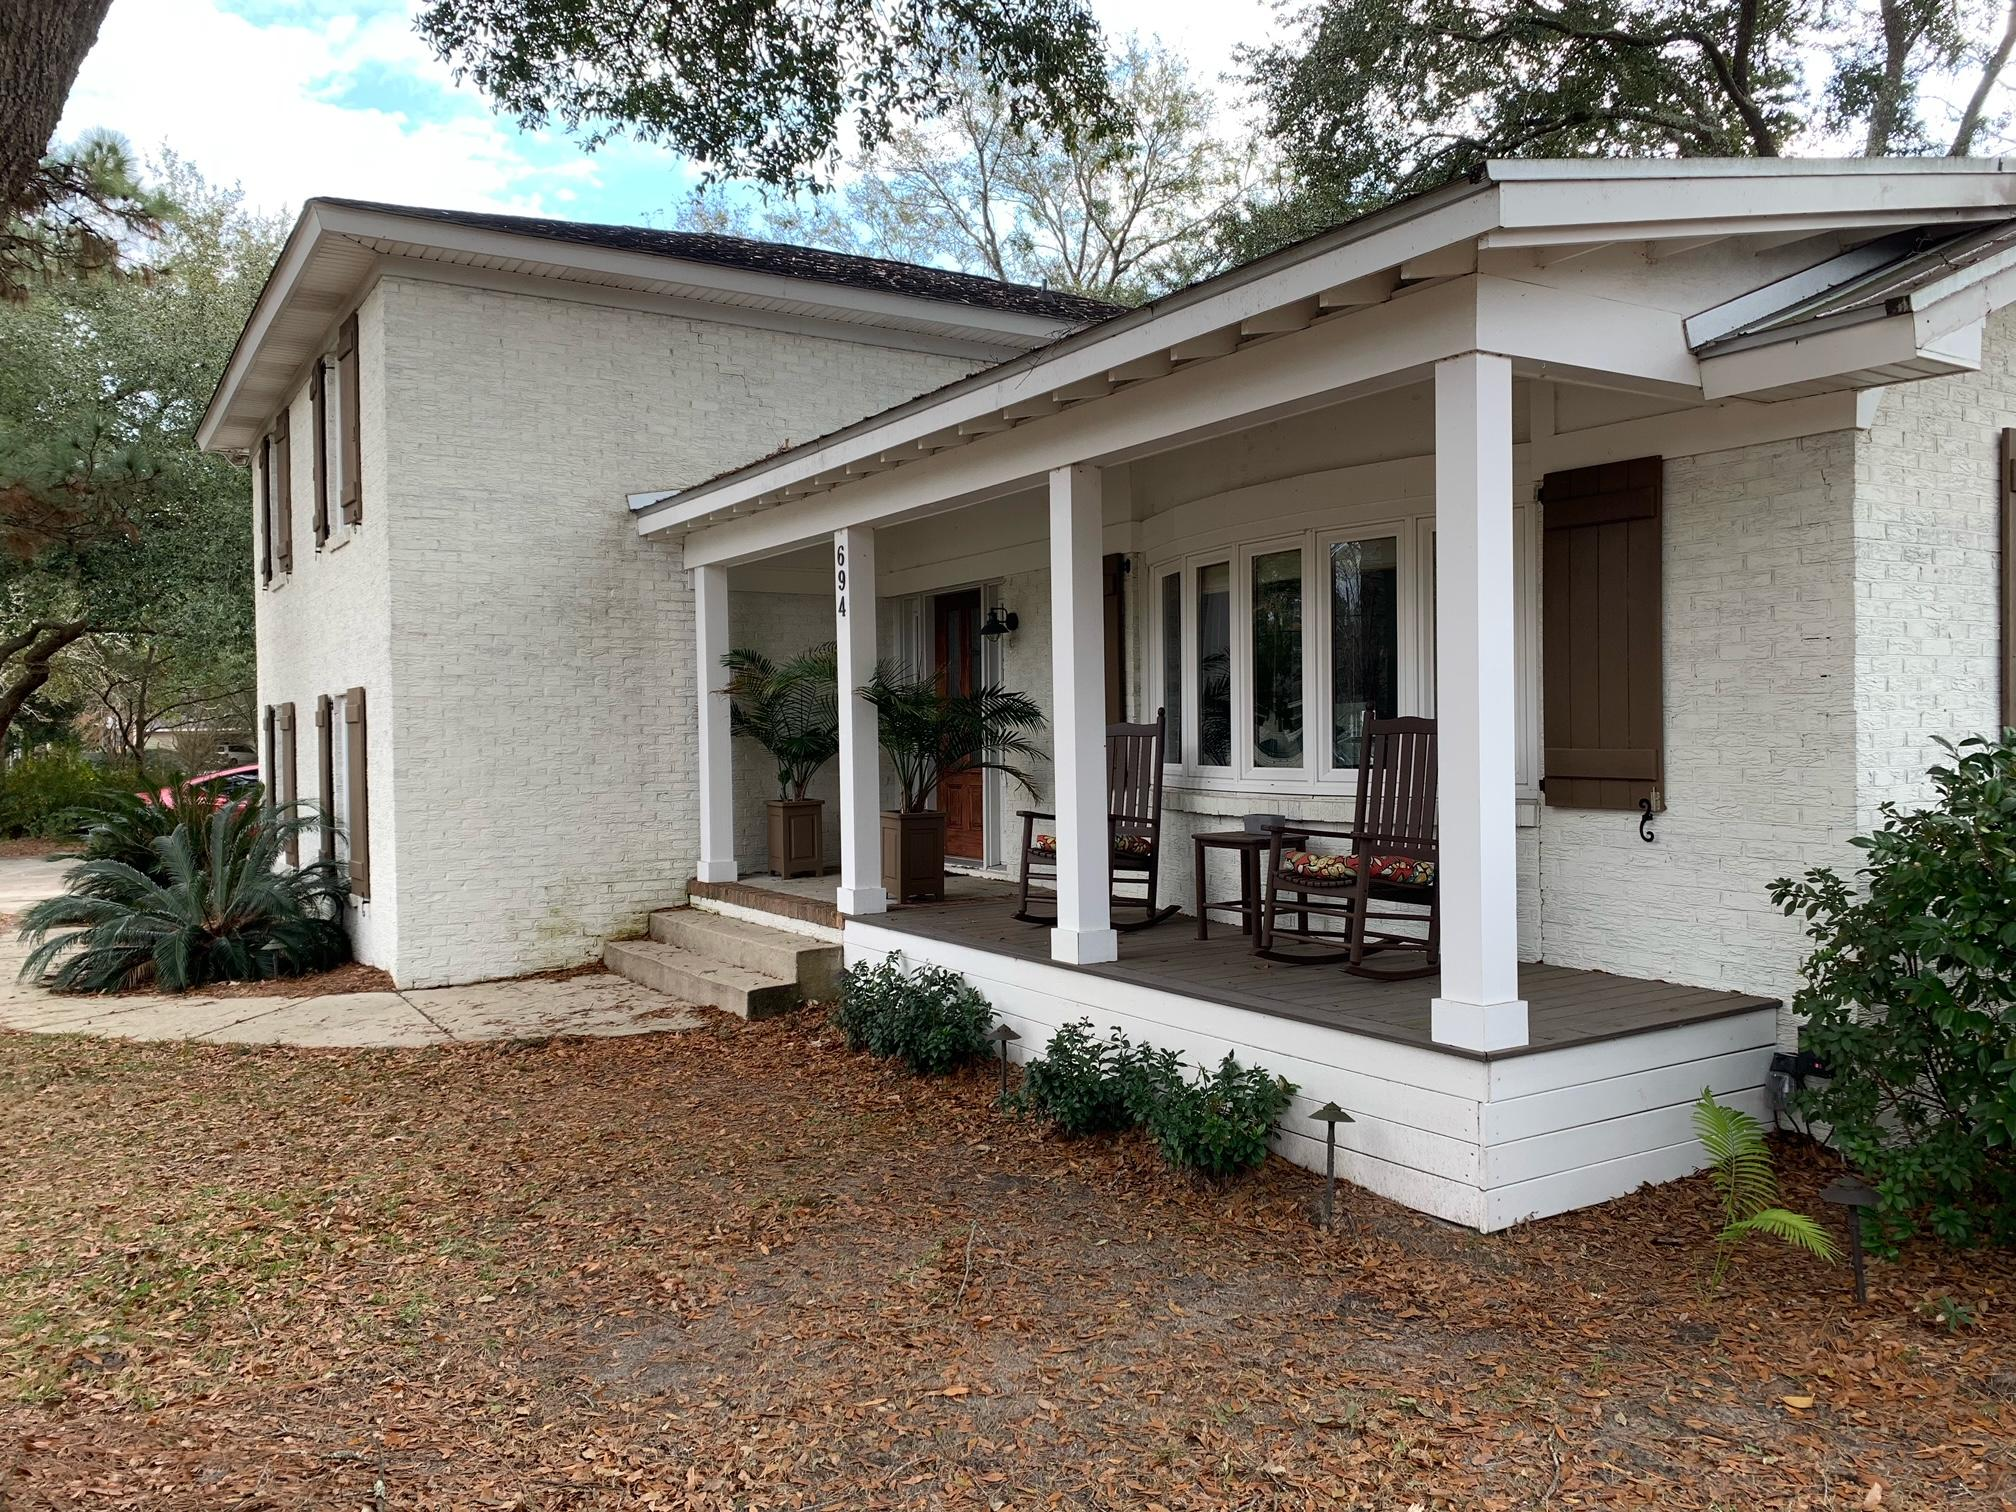 Cooper Estates Homes For Sale - 694 Pawley, Mount Pleasant, SC - 46